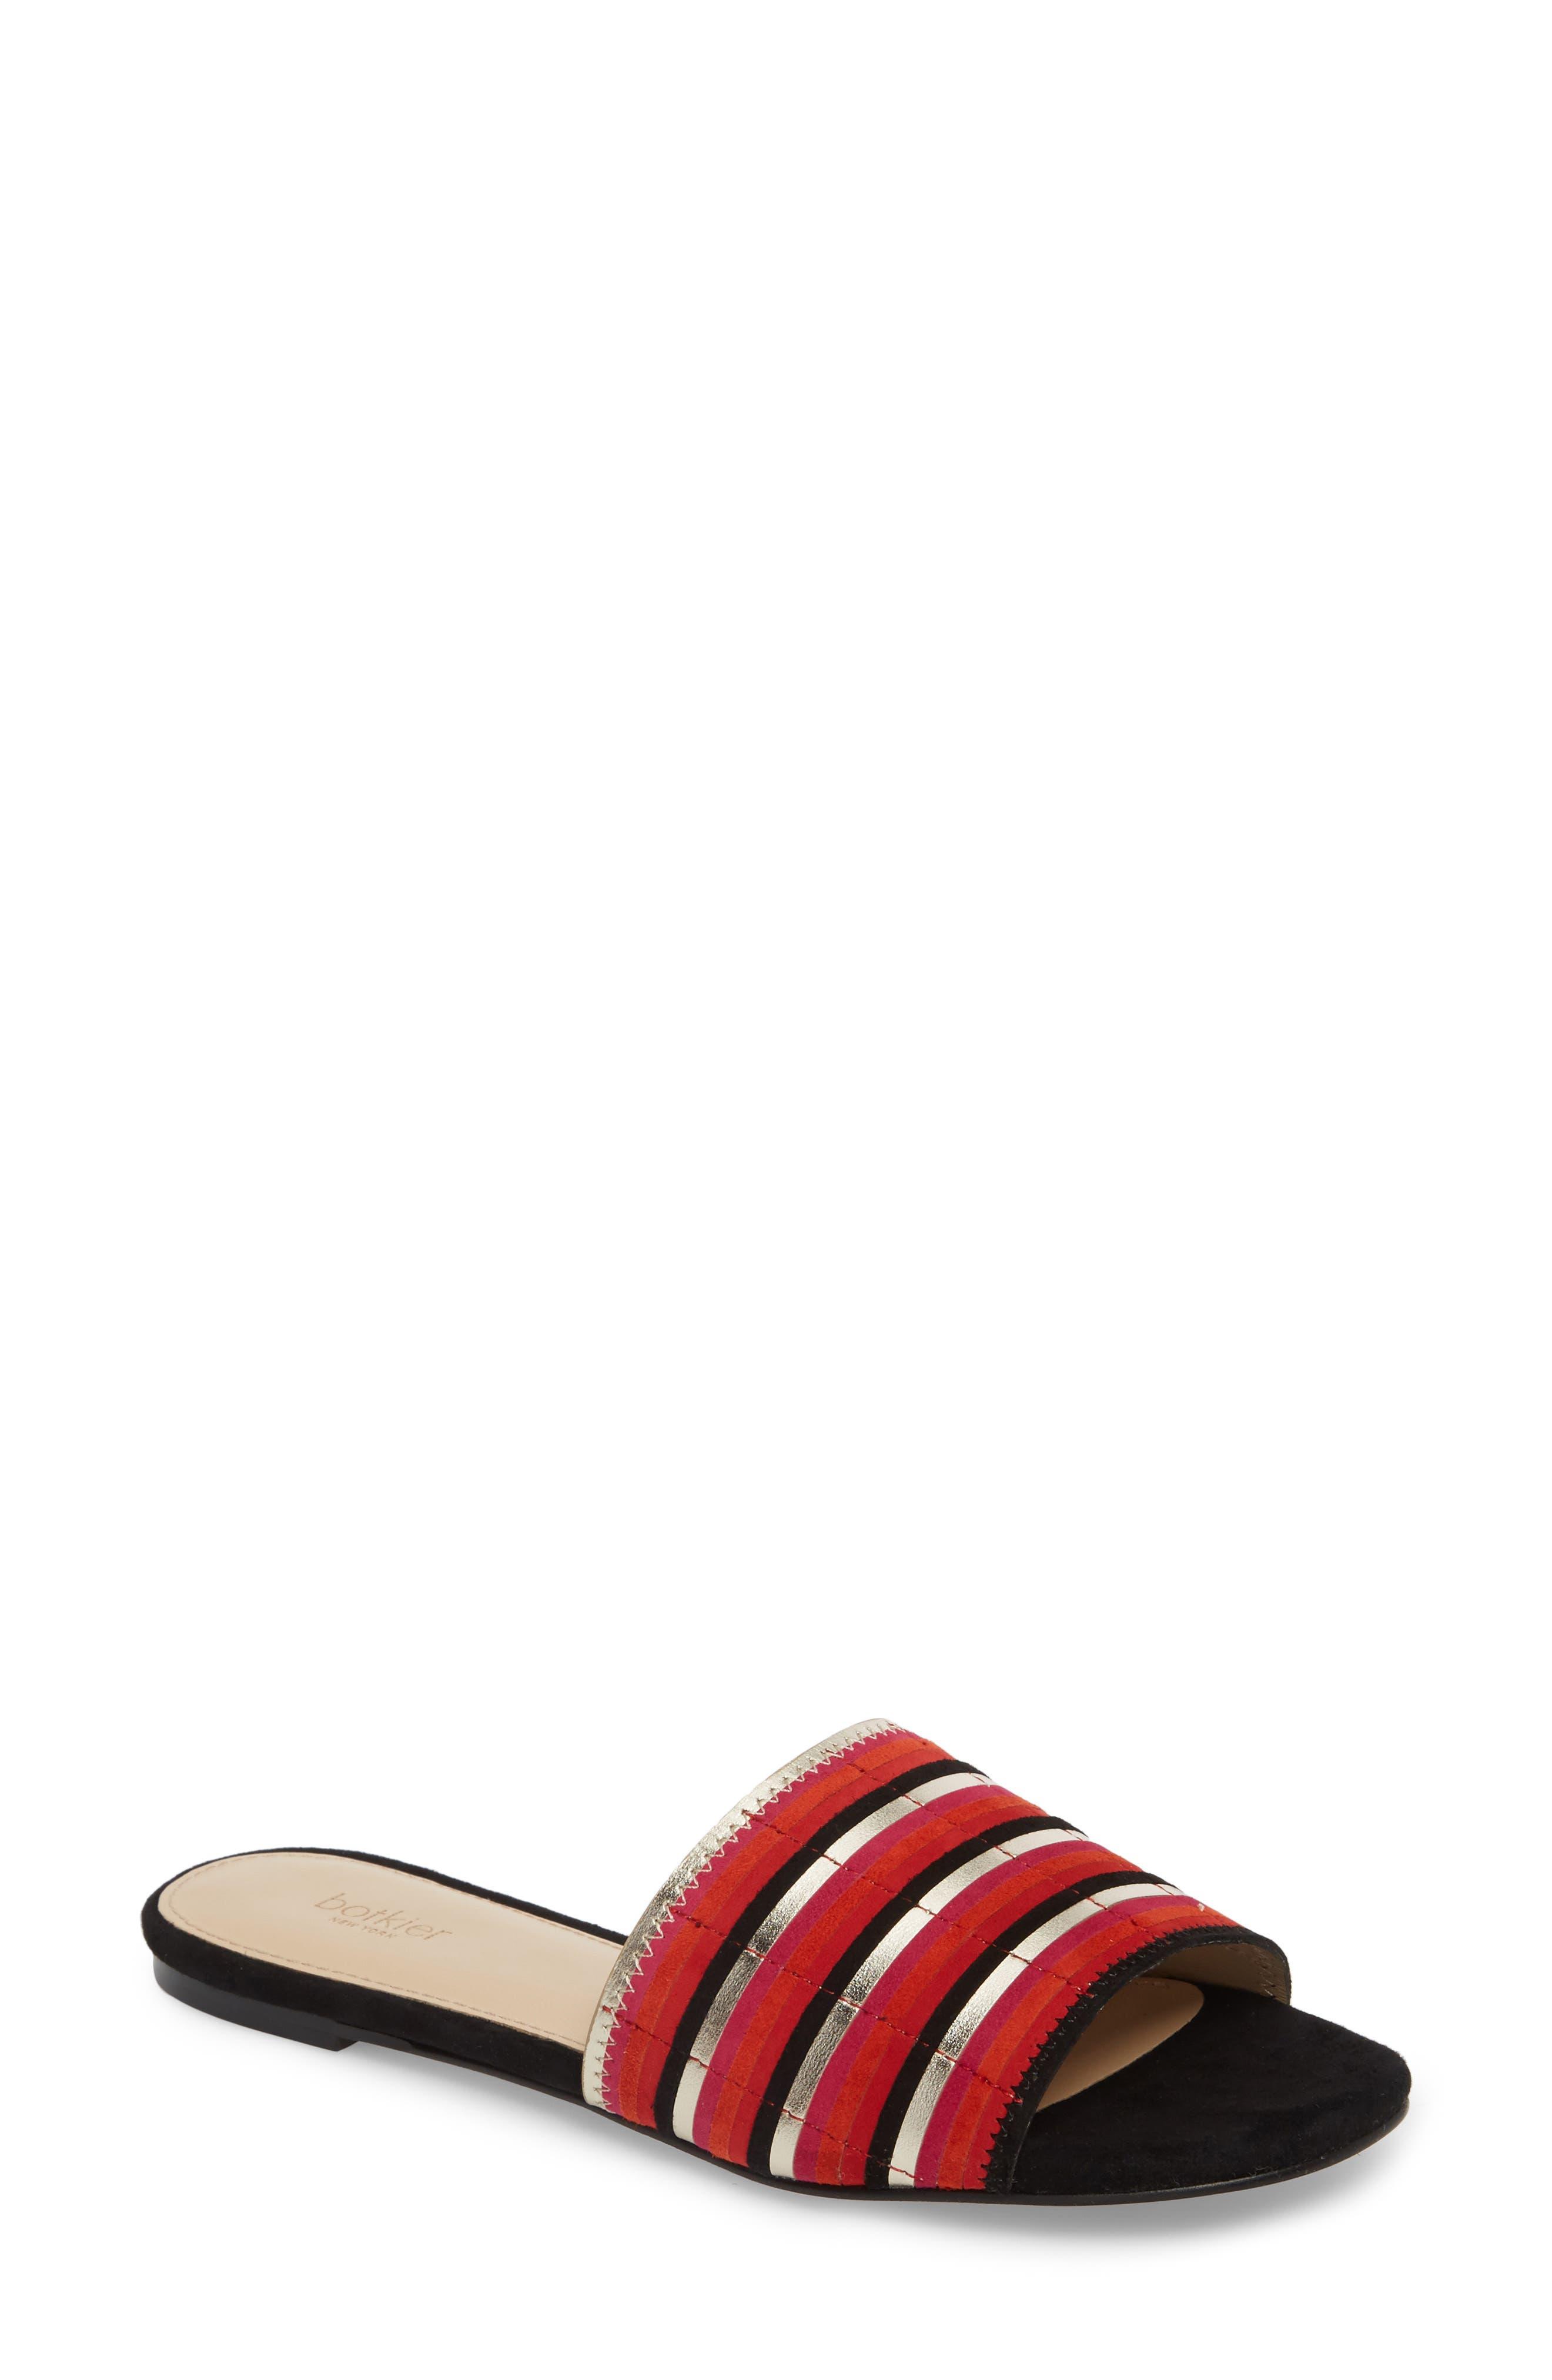 Marley Slide Sandal,                             Main thumbnail 1, color,                             Poppy Suede